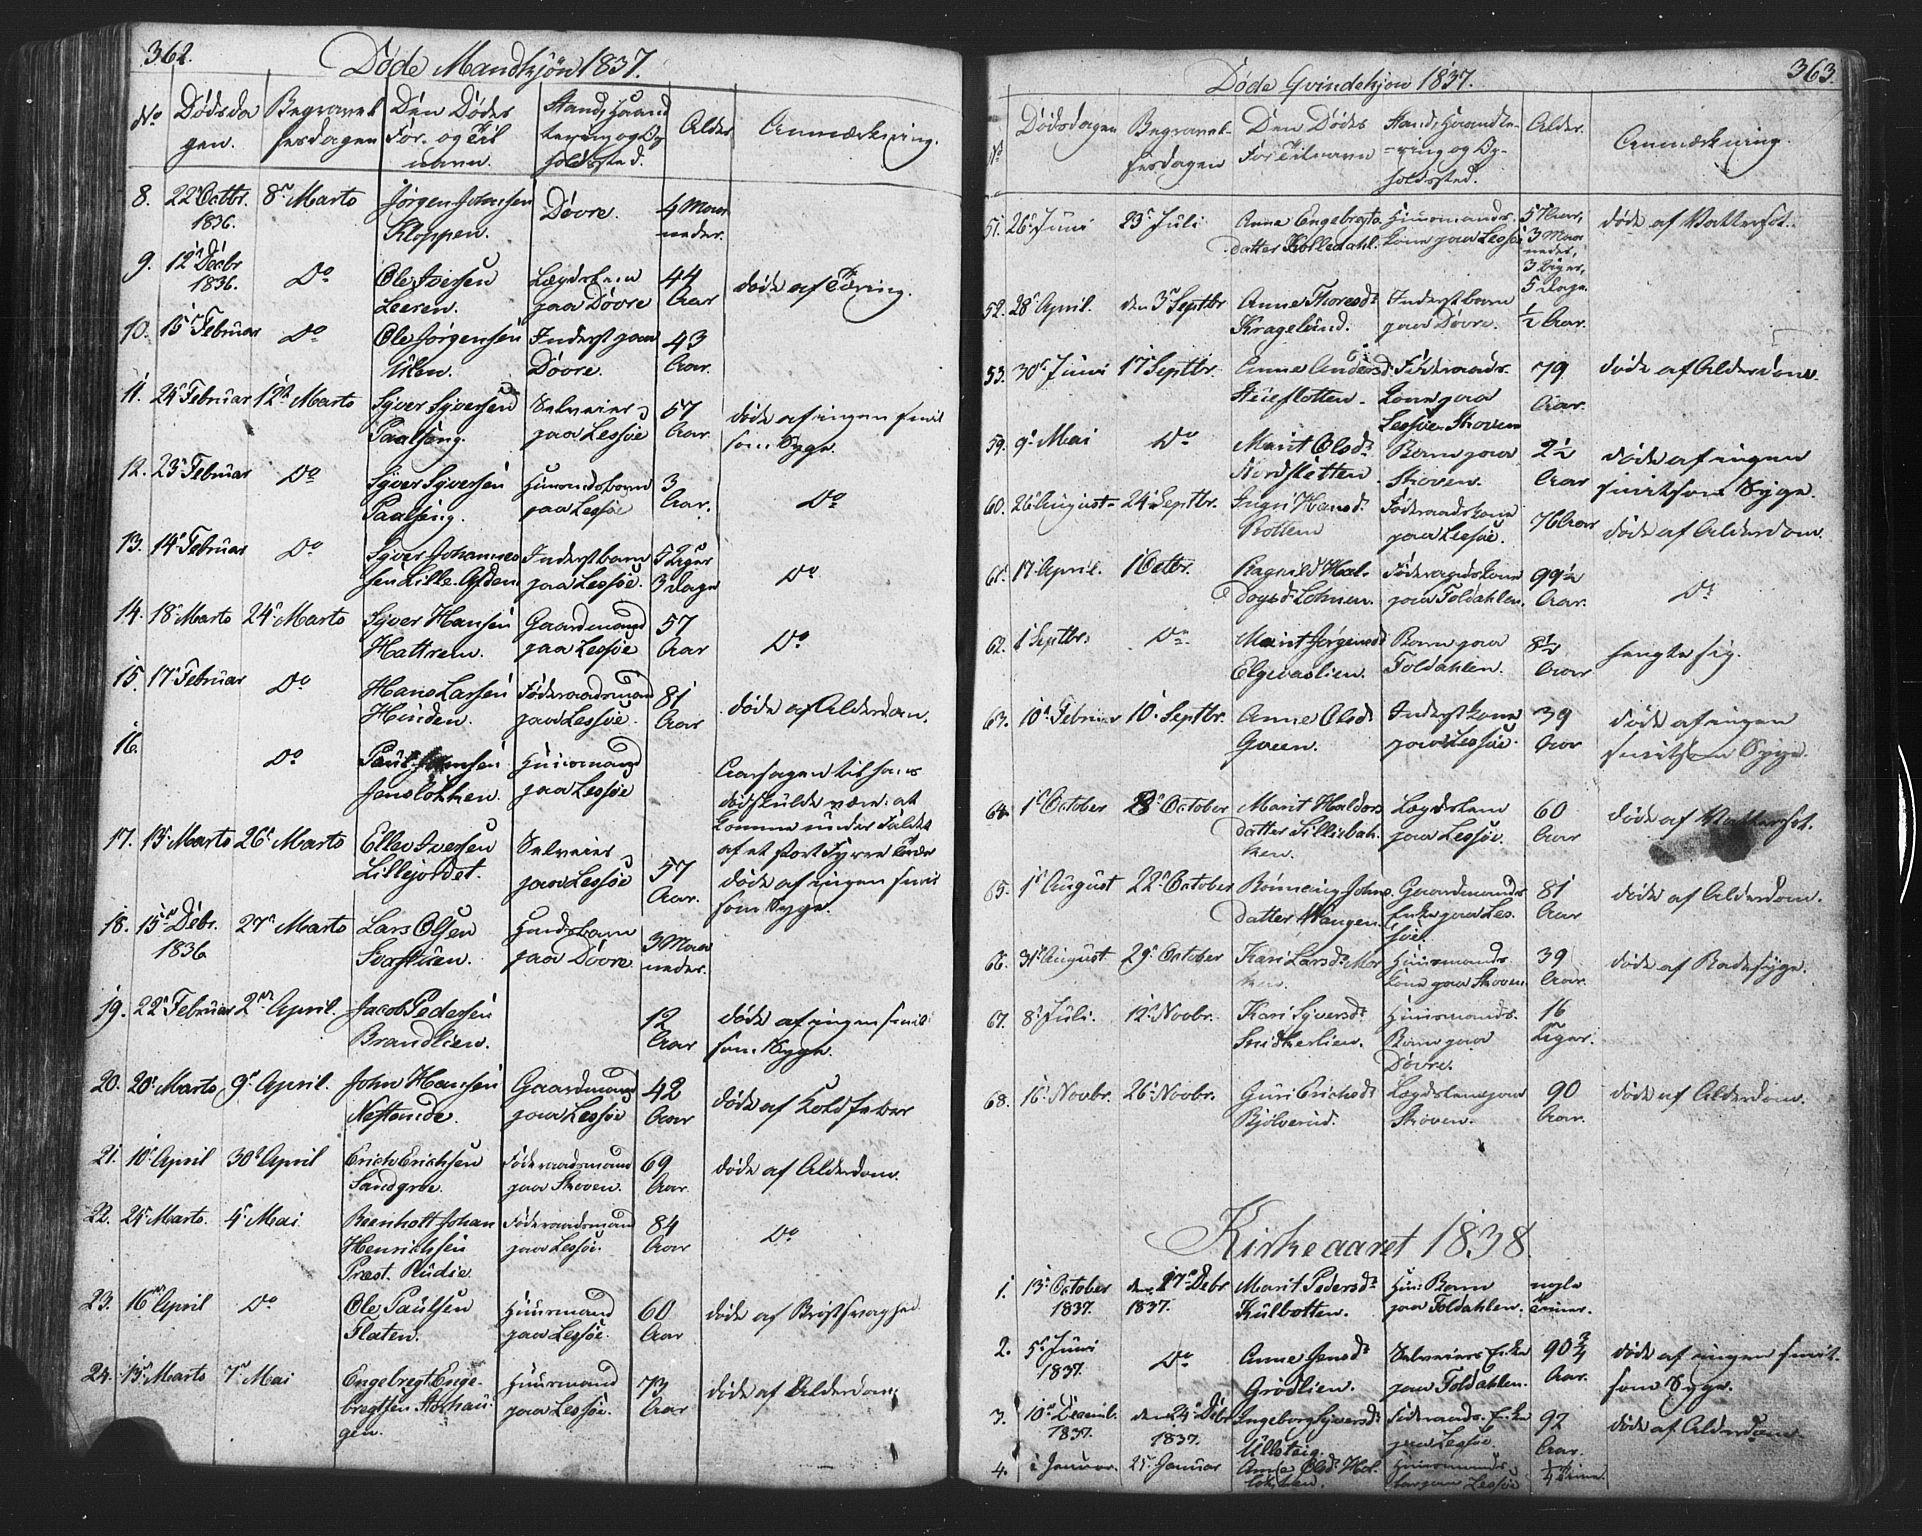 SAH, Lesja prestekontor, Klokkerbok nr. 2, 1832-1850, s. 362-363